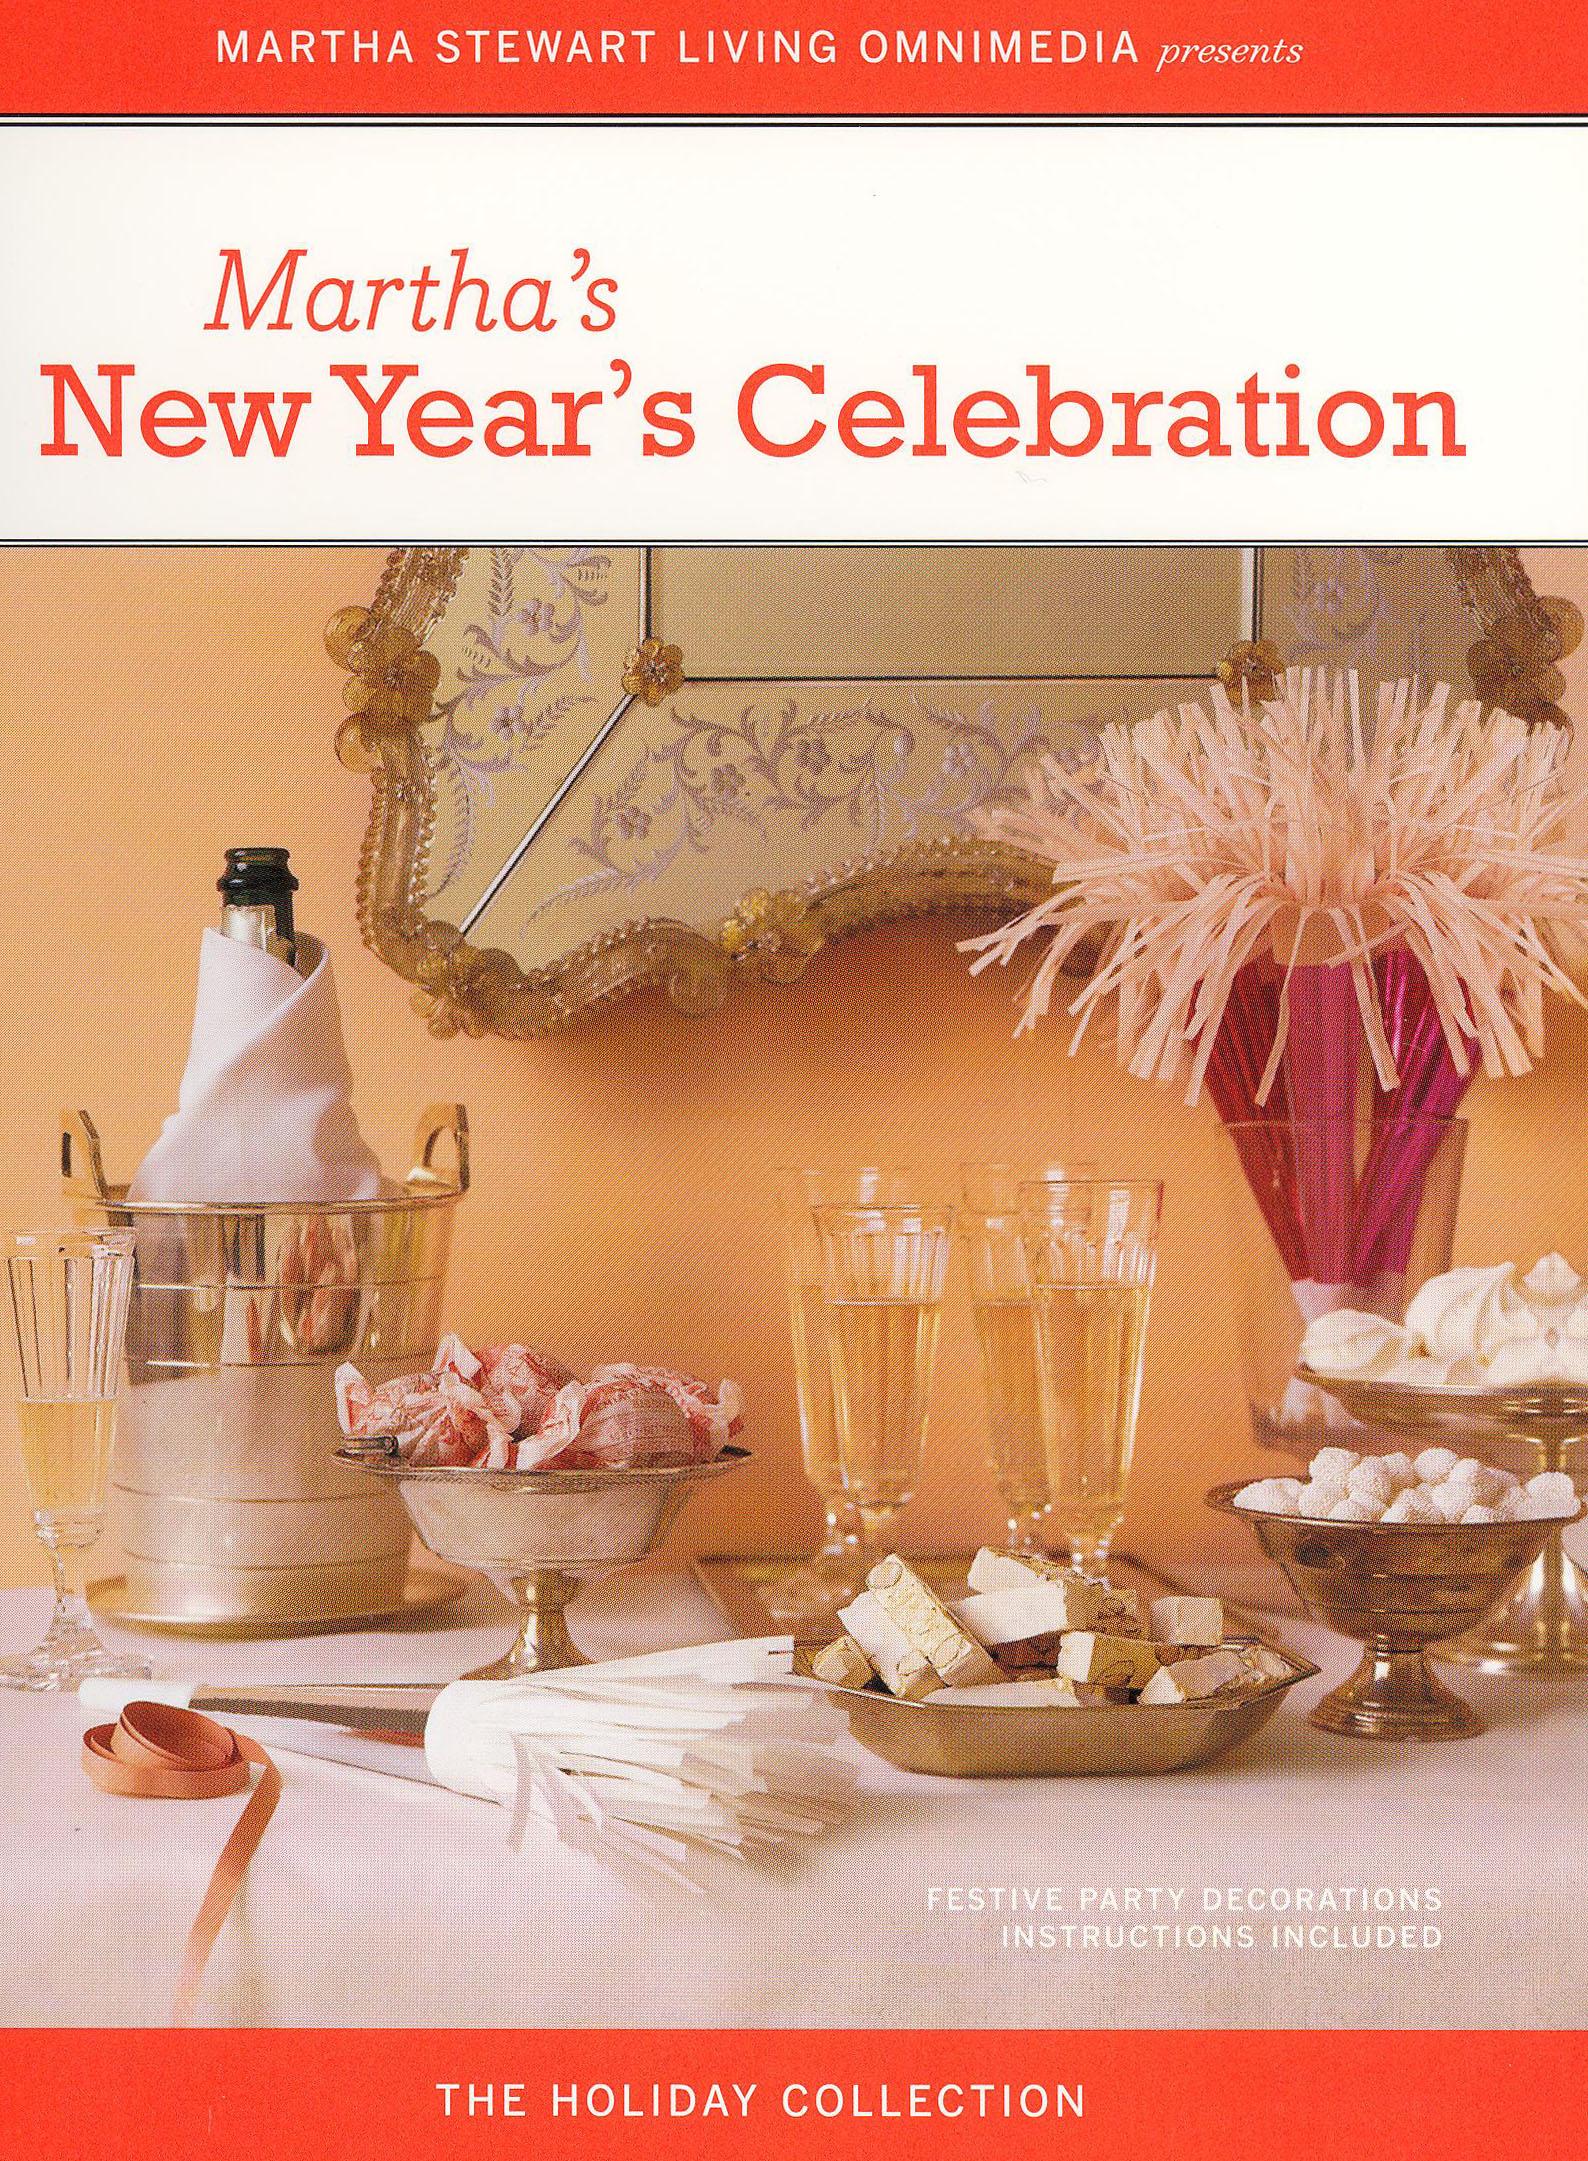 Martha Stewart: Martha's New Year's Celebration